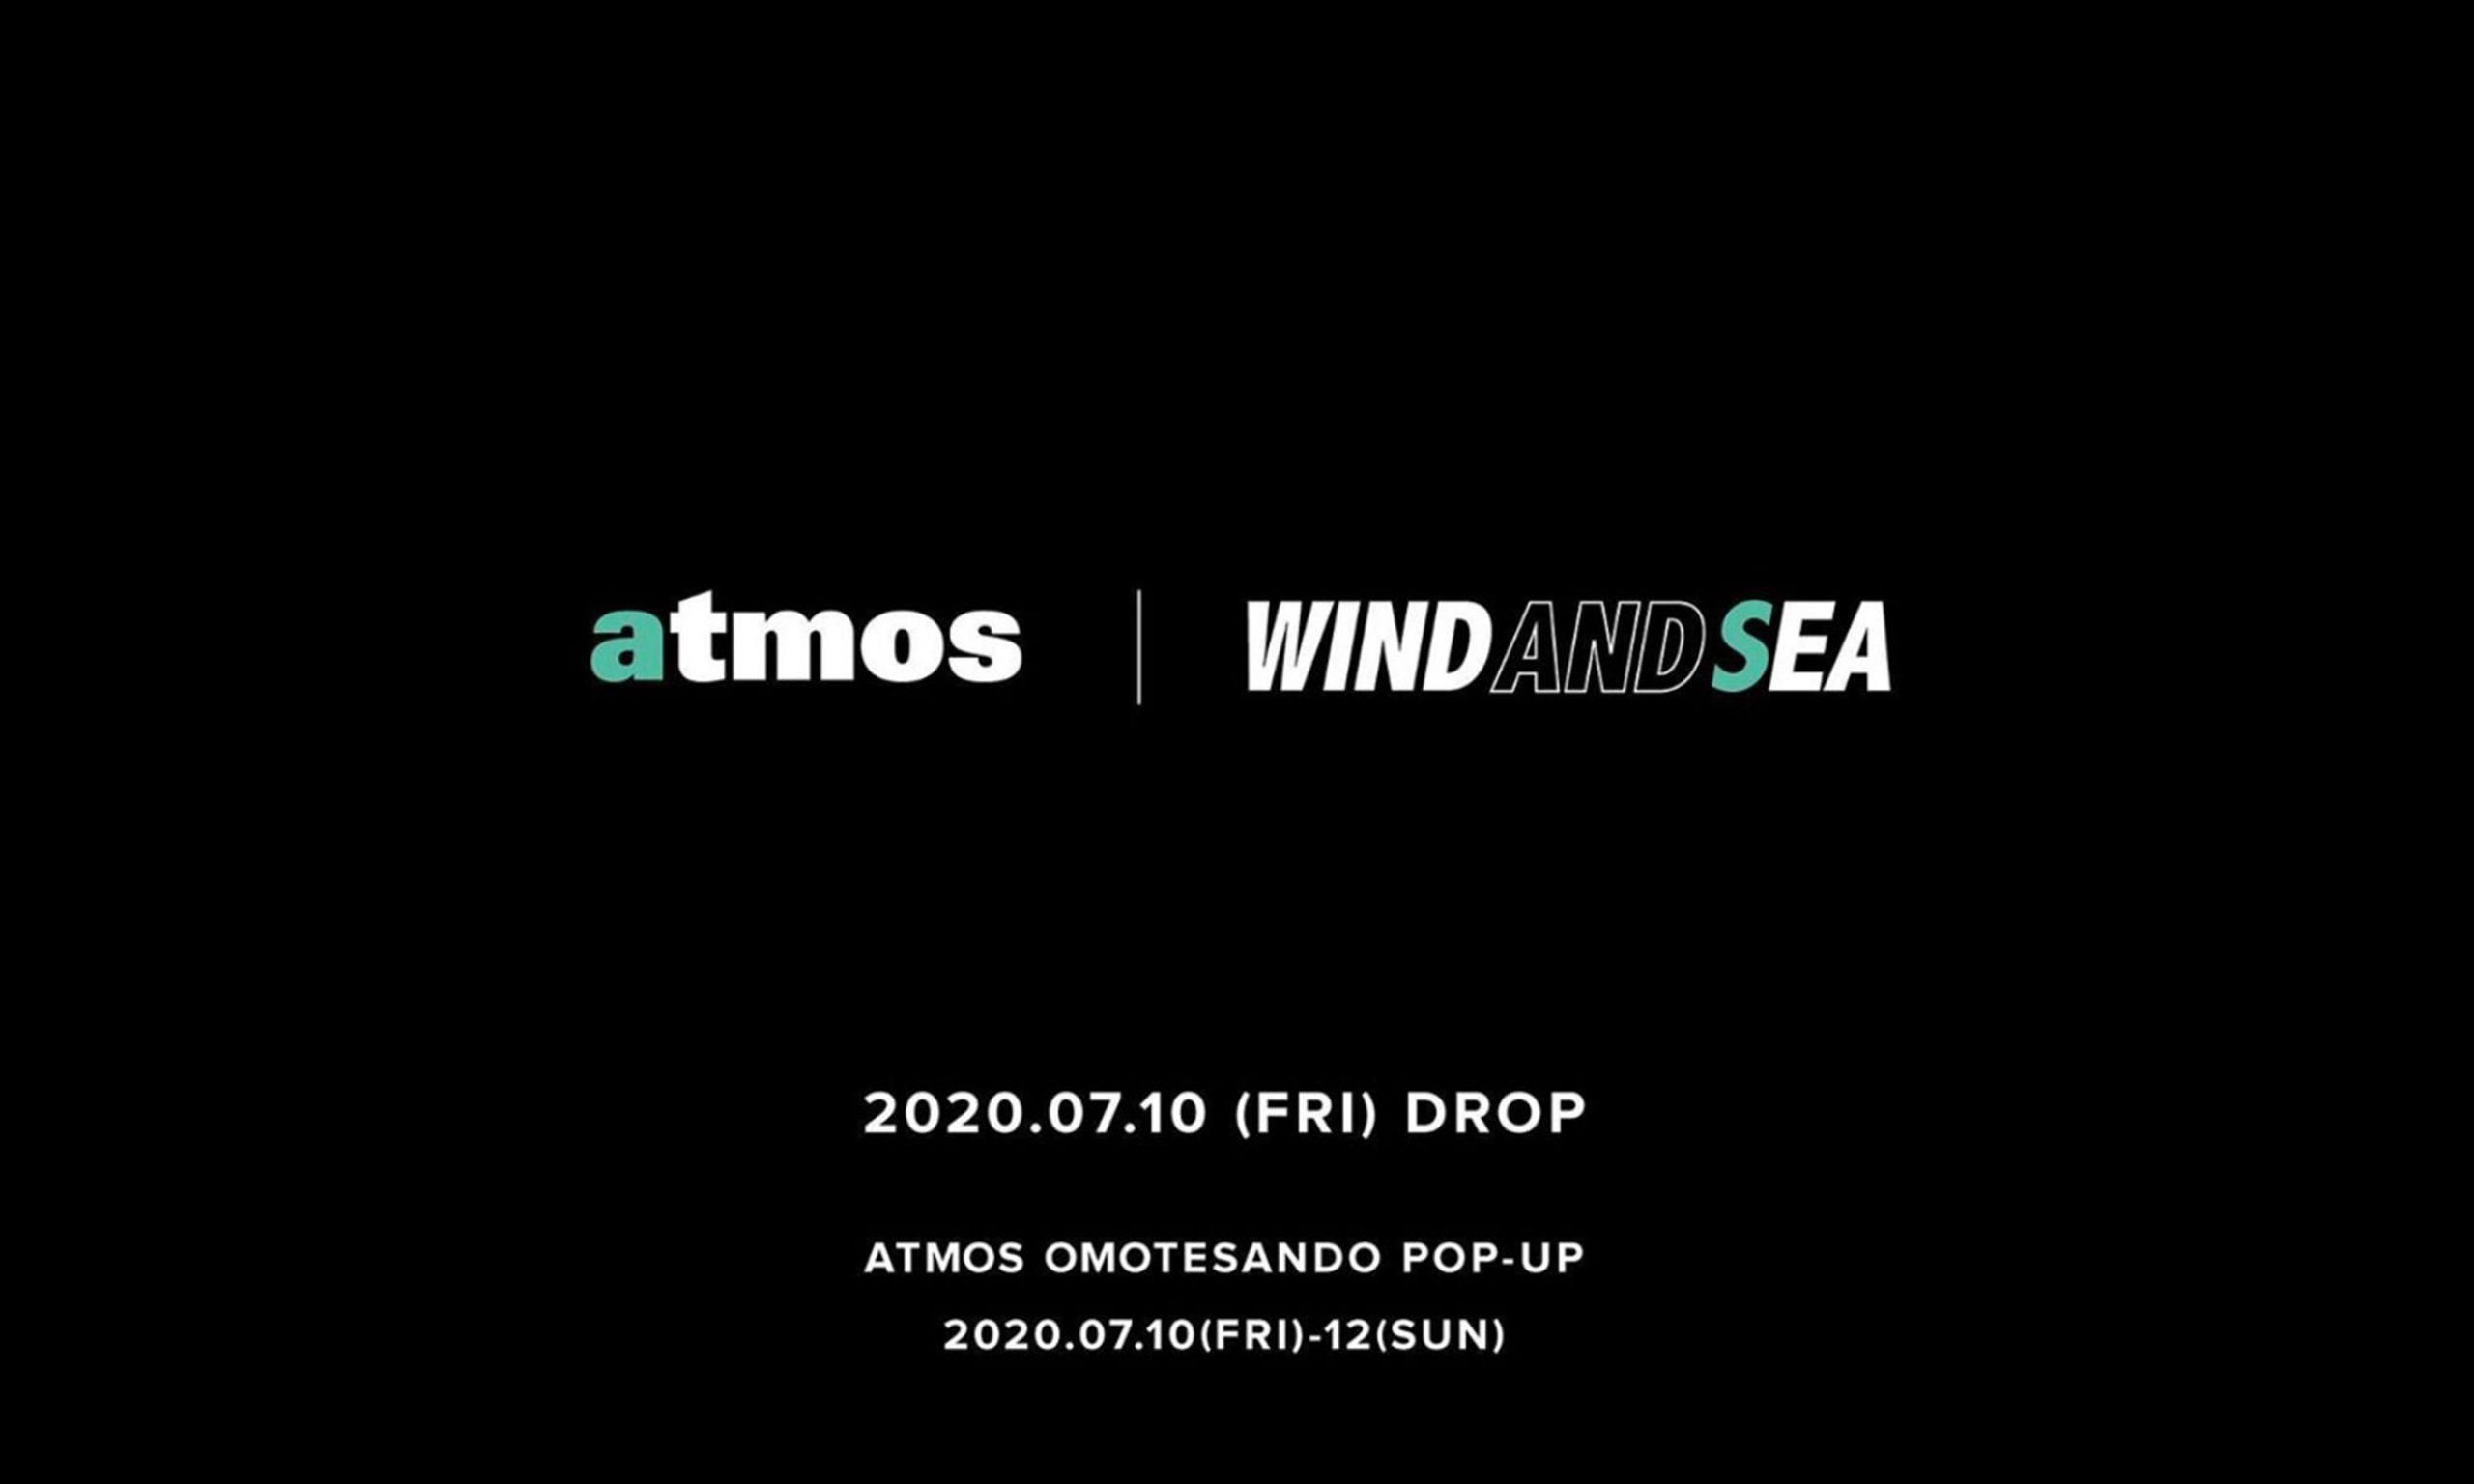 atmos x WIND AND SEA 联名合作系列公开